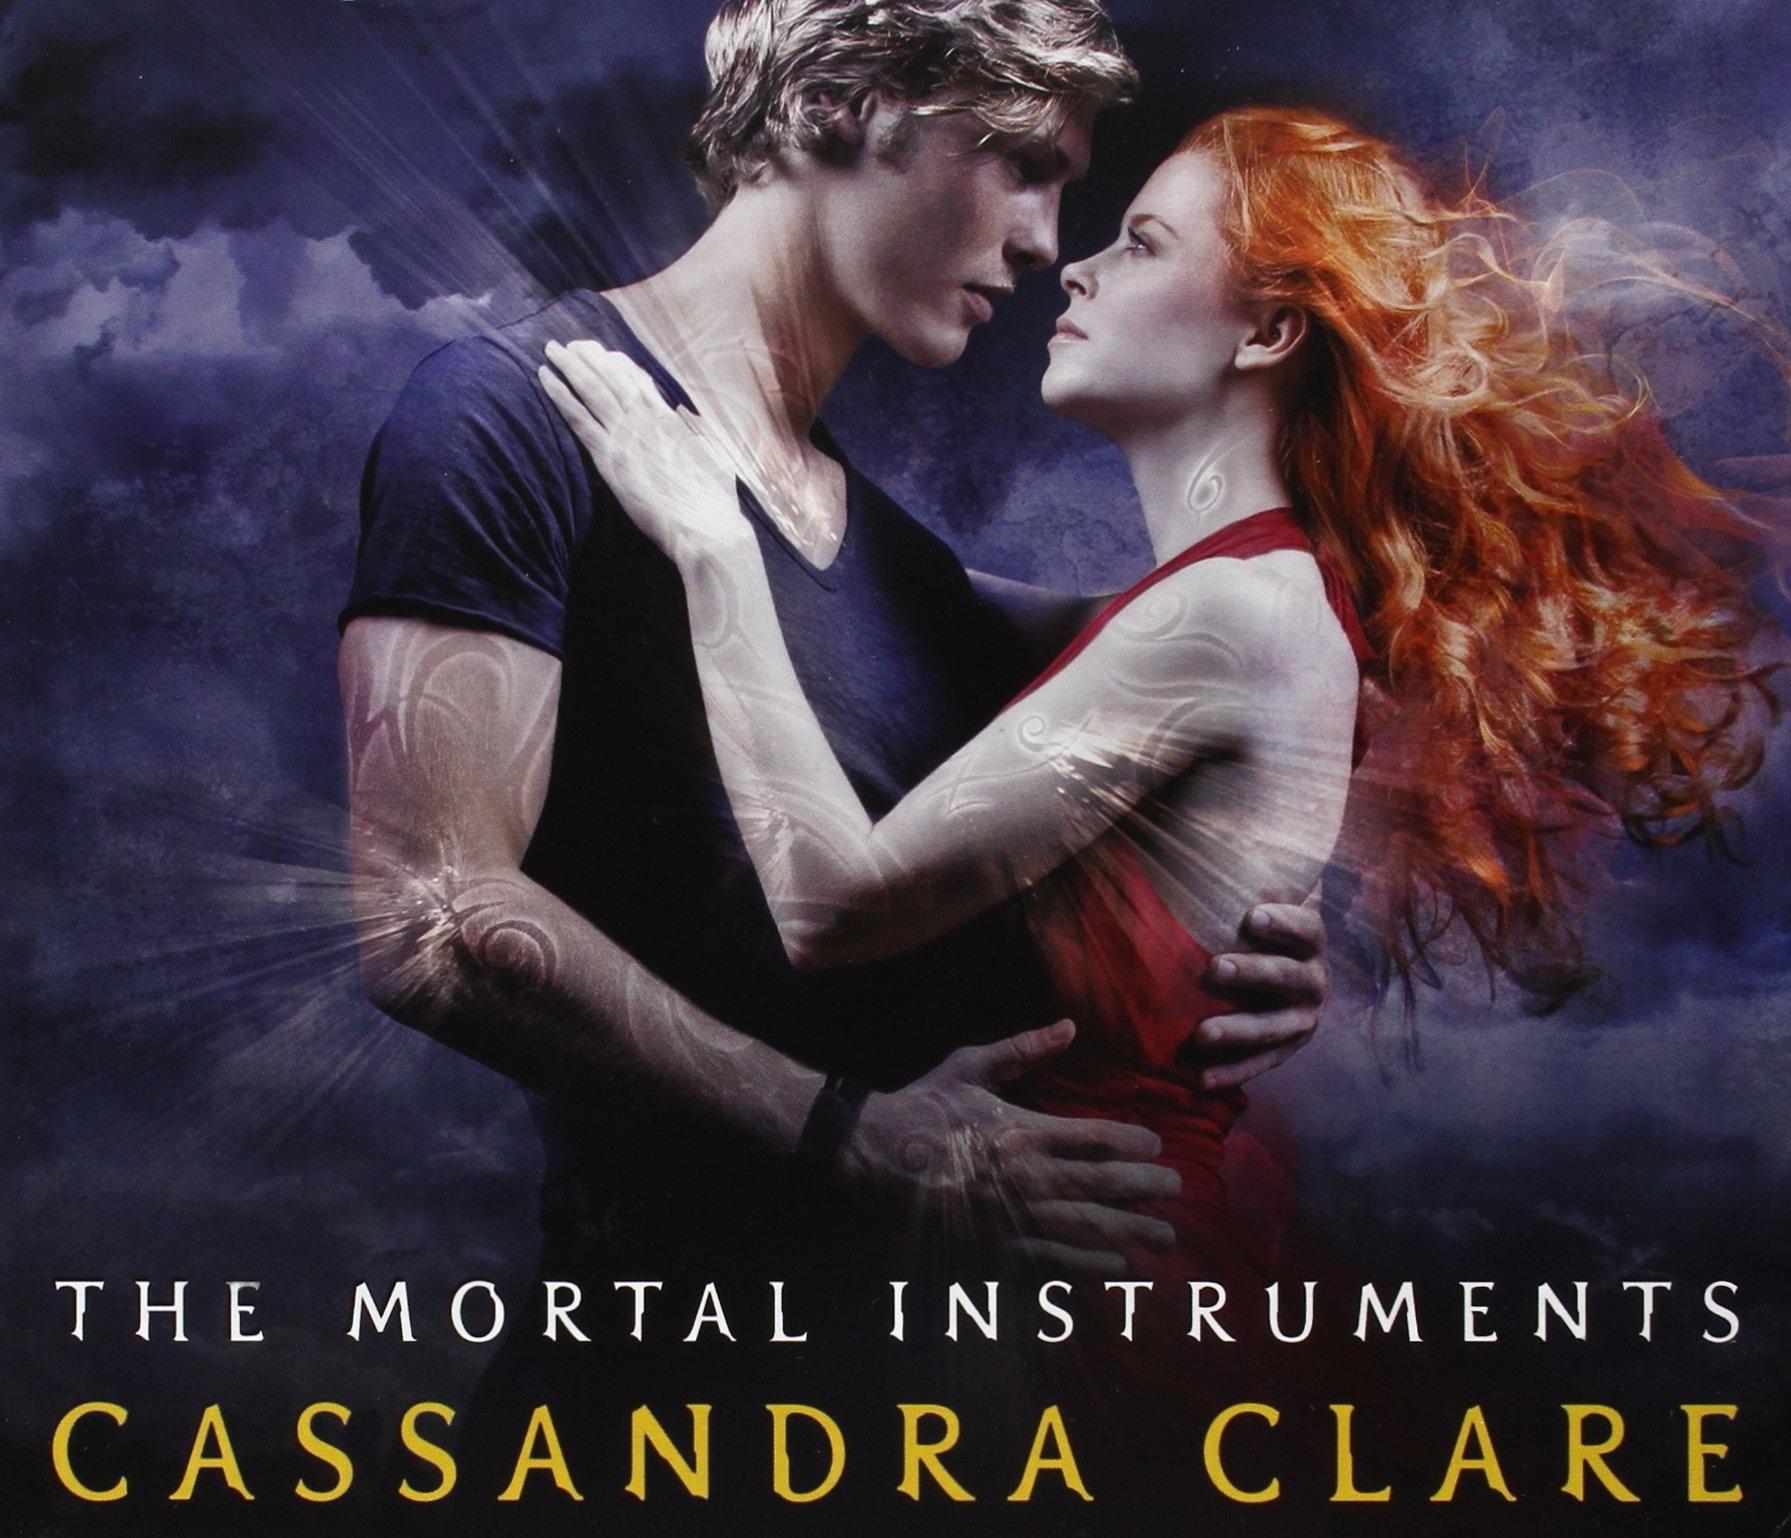 The Mortal Instruments: Book 1-6 - Cassandra Clare [6 Bände, Paperback, inkl. Slipcase]